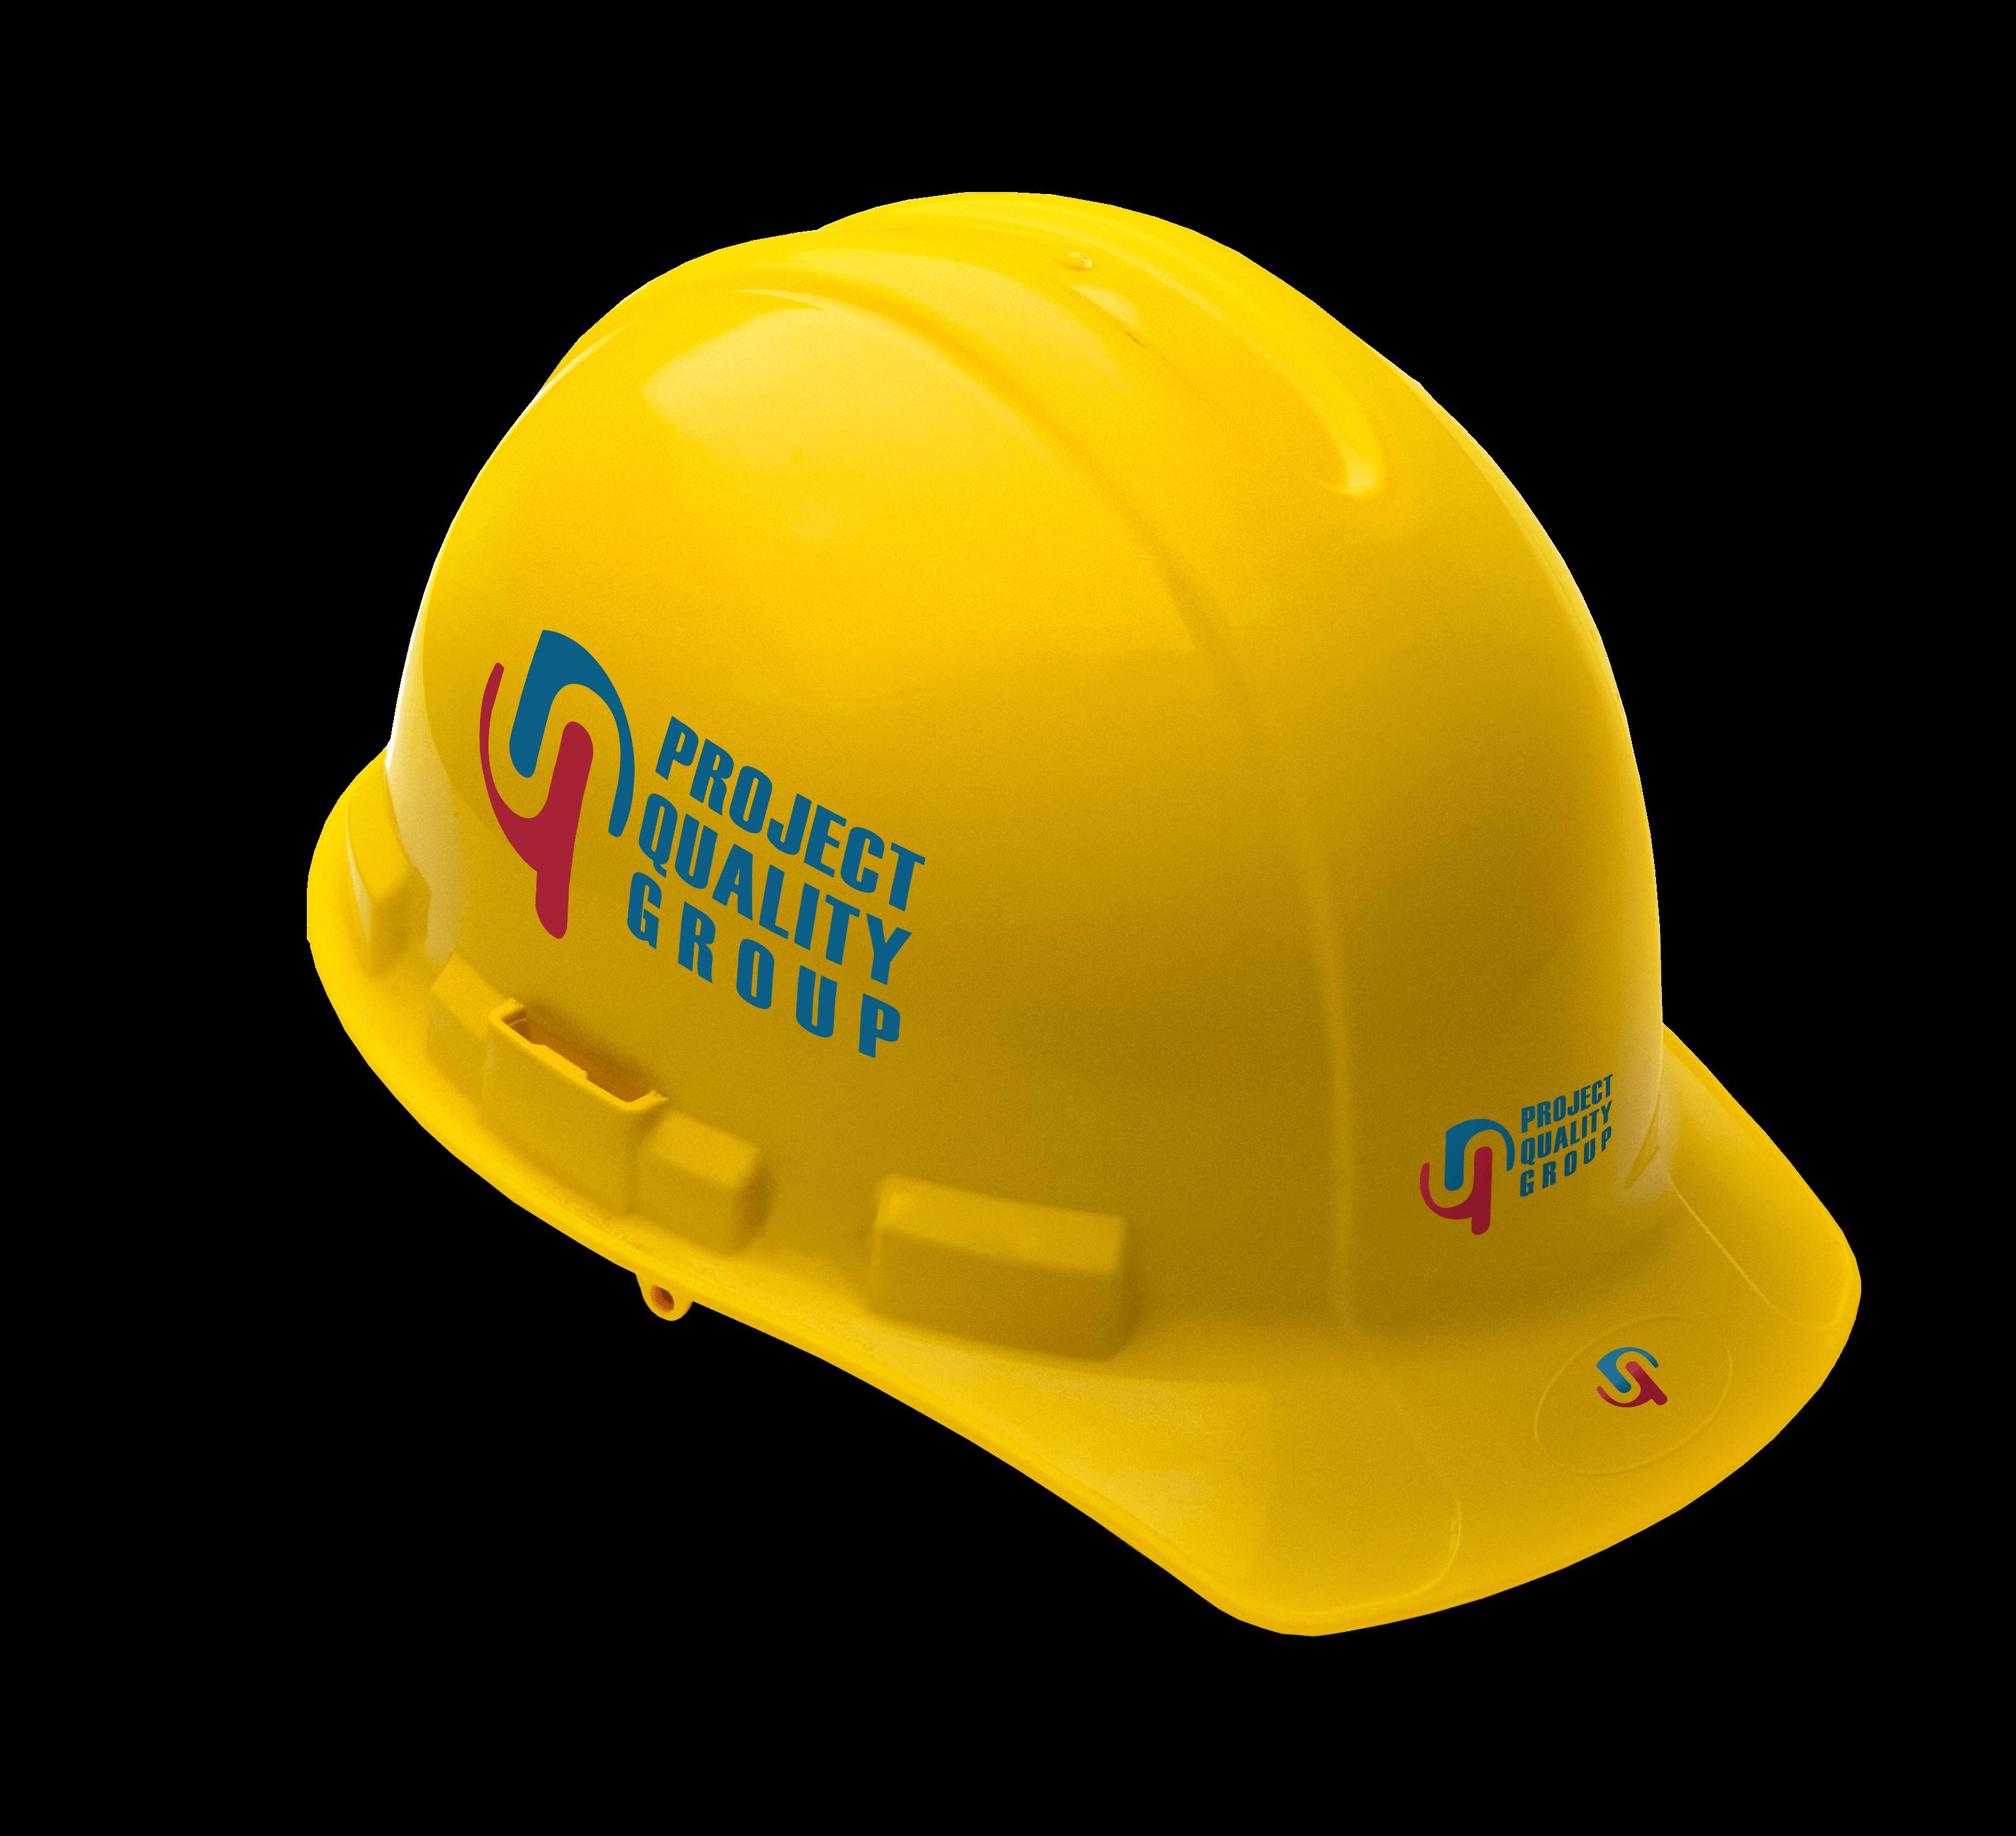 4ecbcb3b124 construction helmet mockup – Project Quality Group